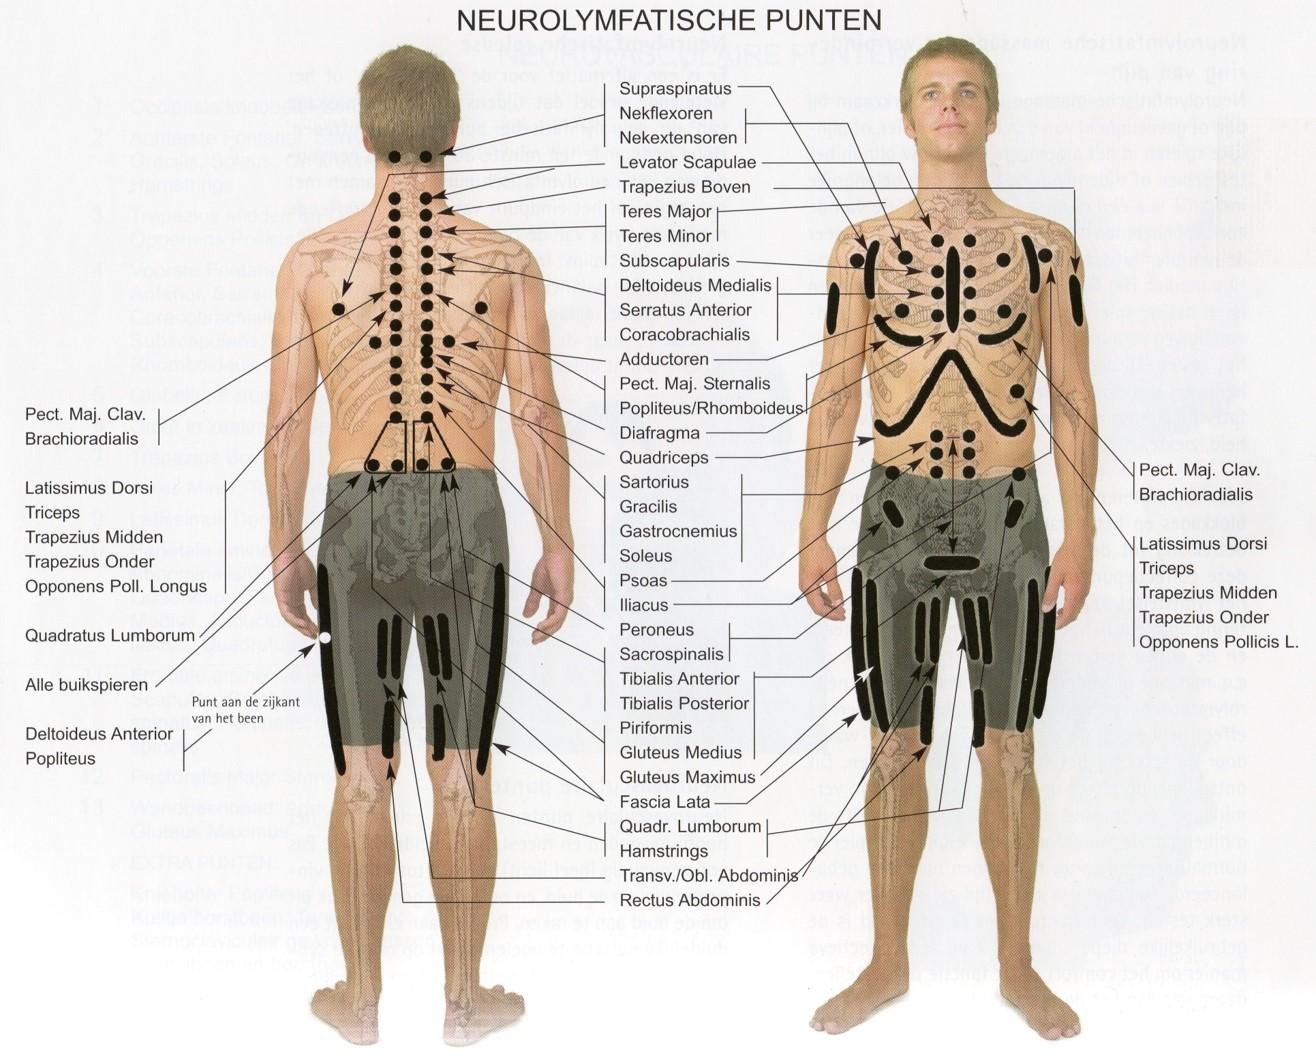 neurolymfatische punten